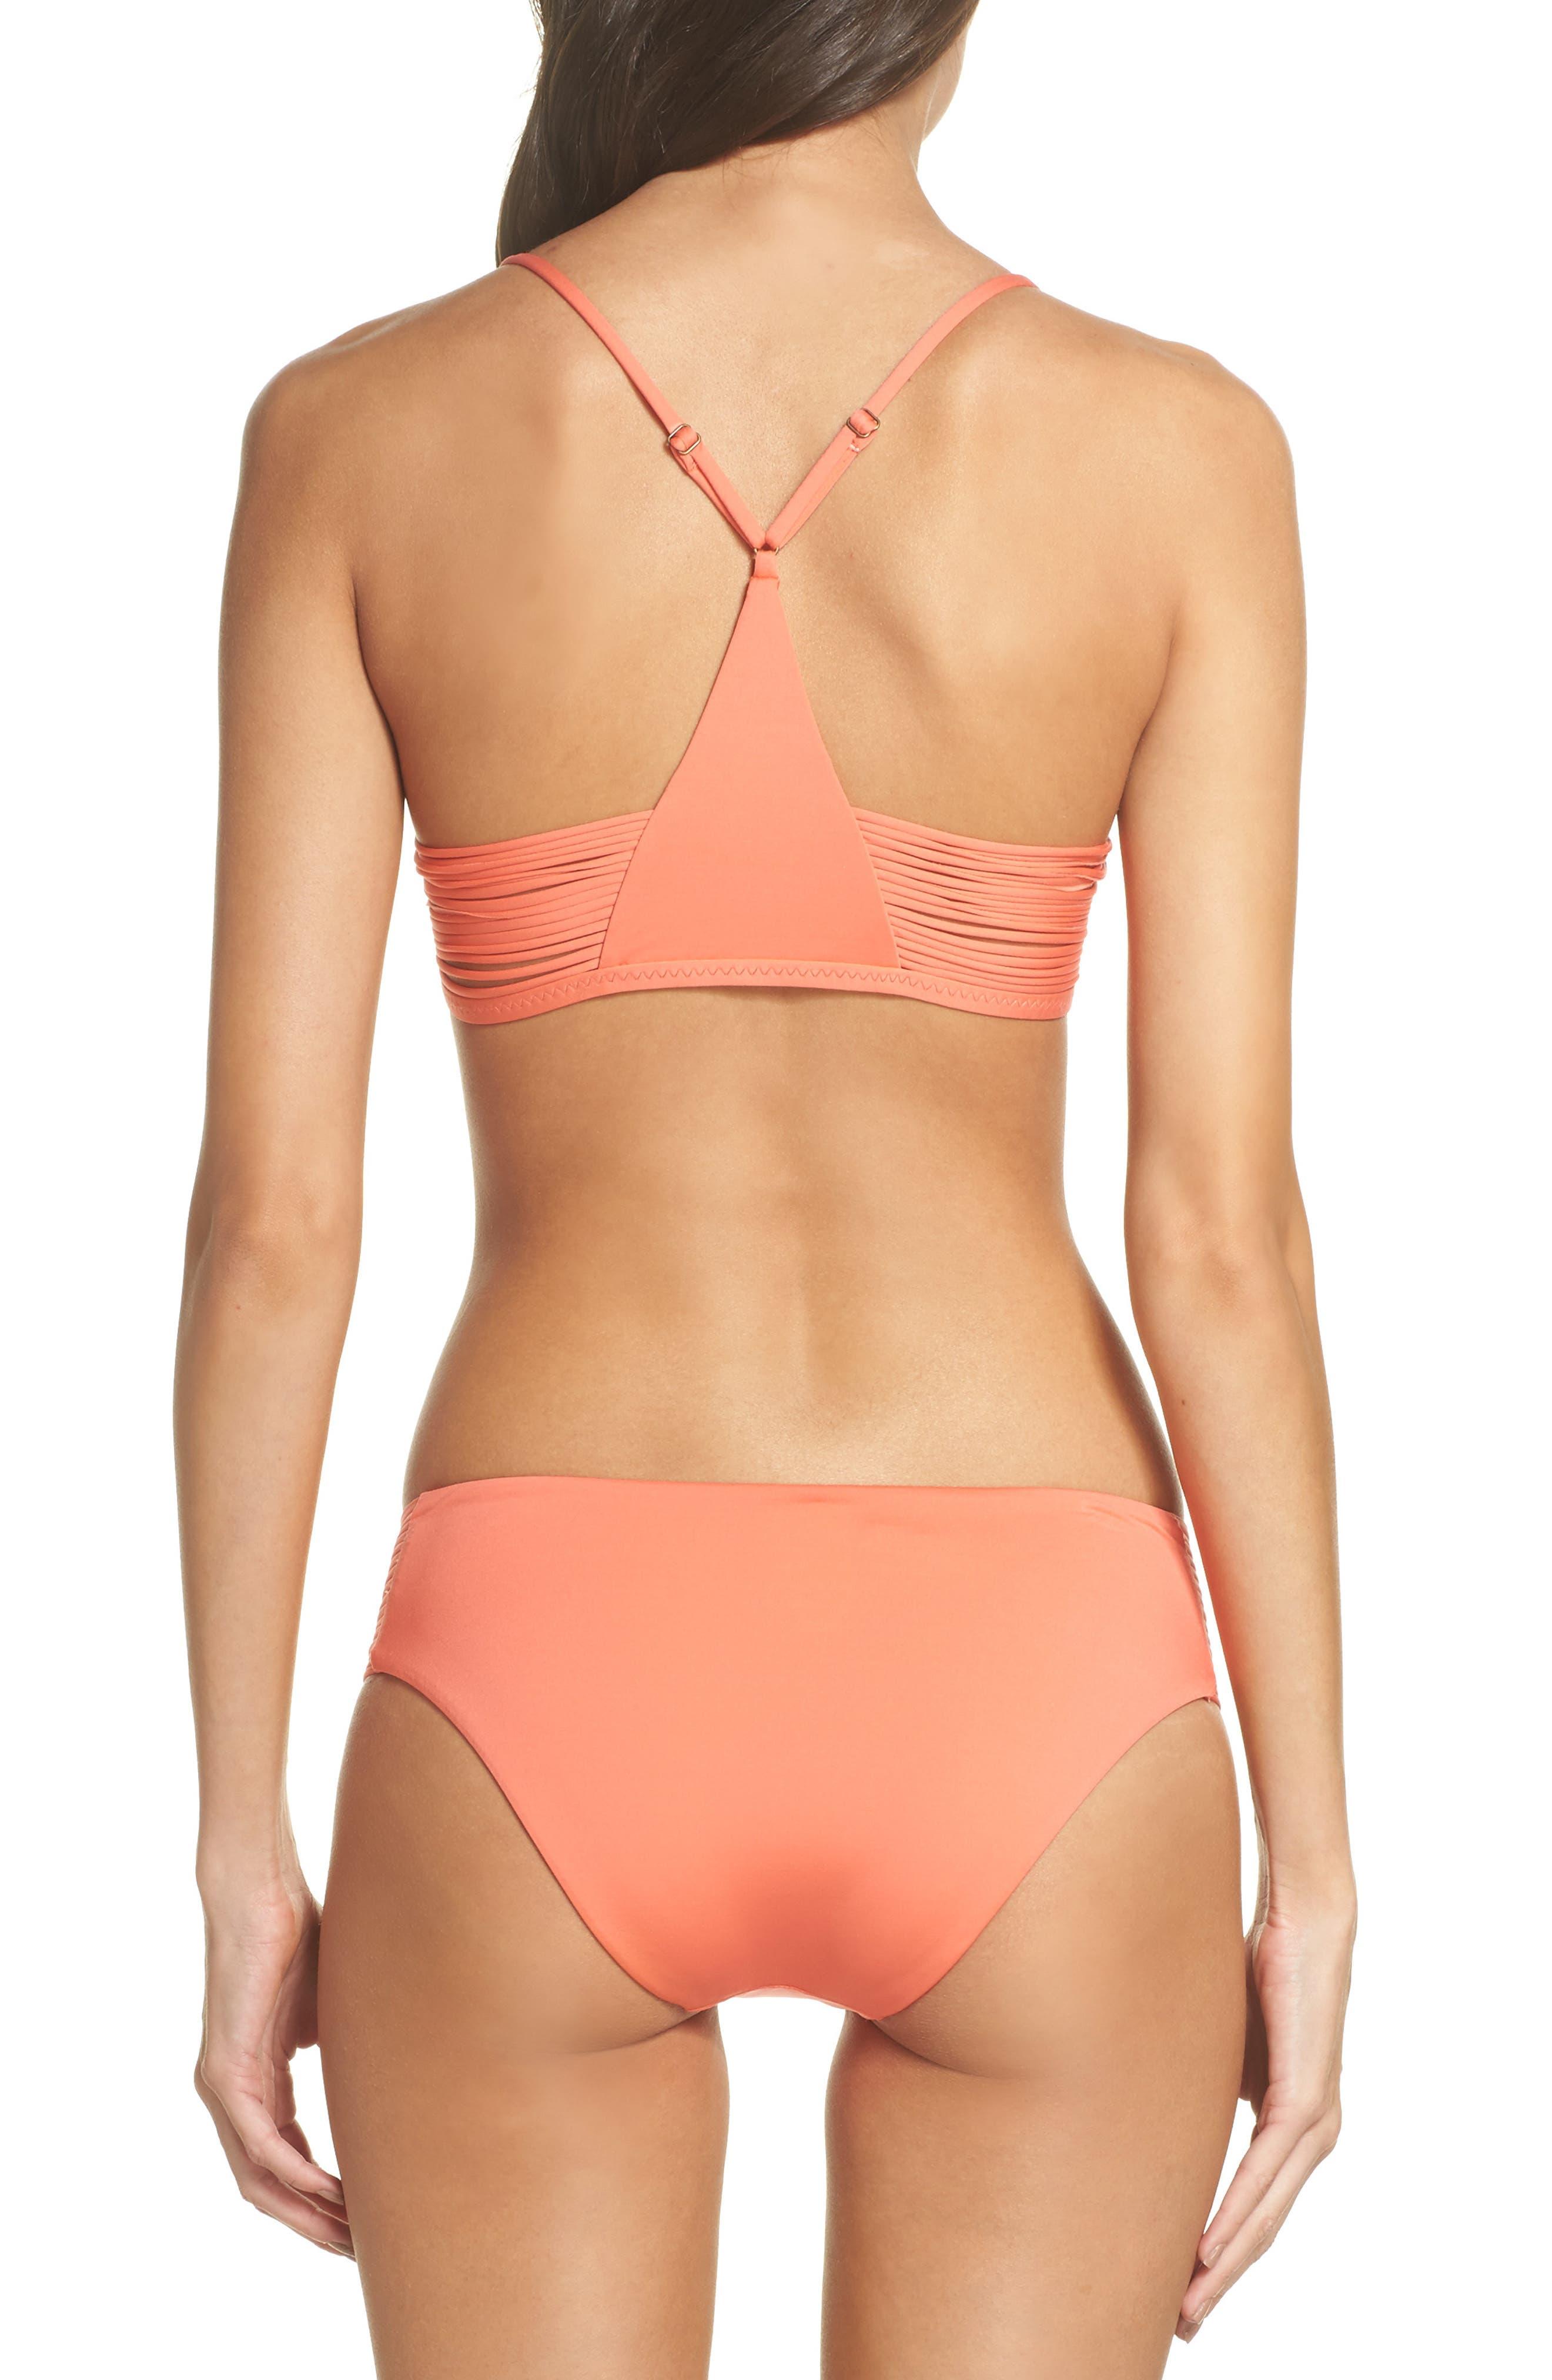 Beach Solids Maui Bikini Bottoms,                             Alternate thumbnail 6, color,                             Persimmon